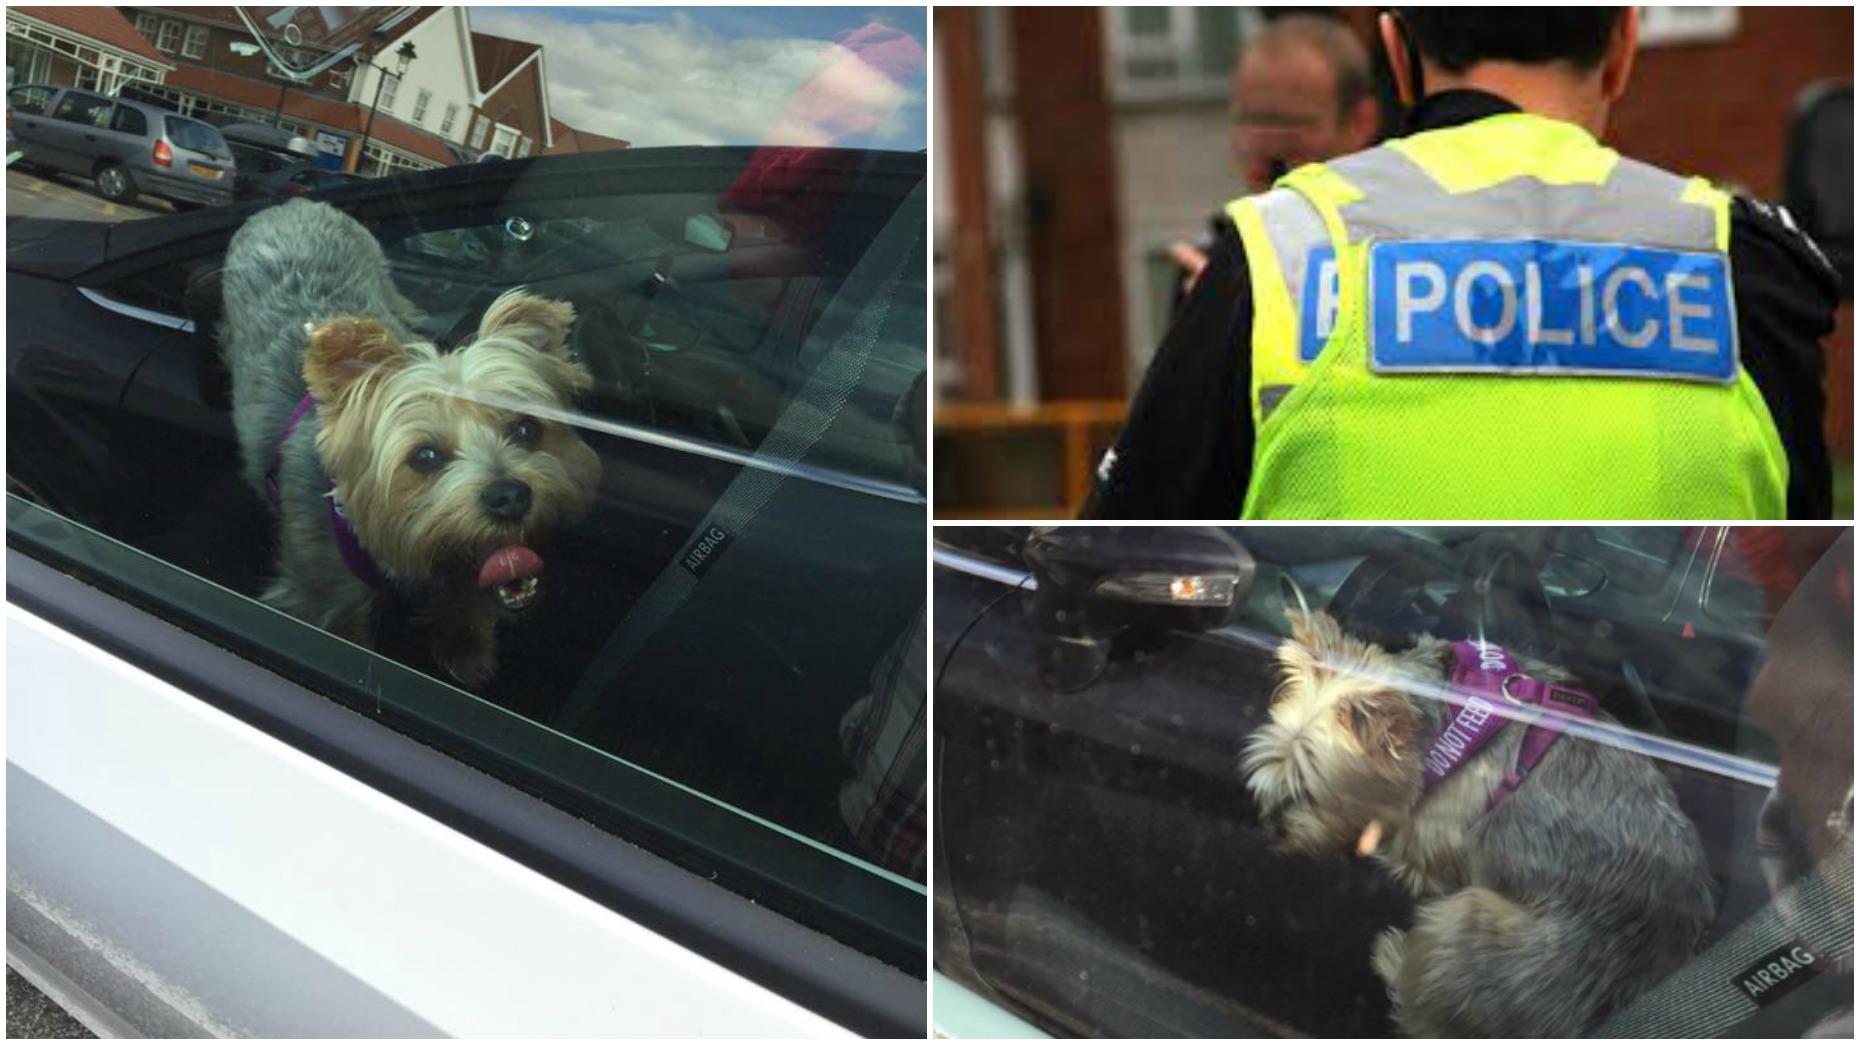 Police Advice Dog In Hot Car